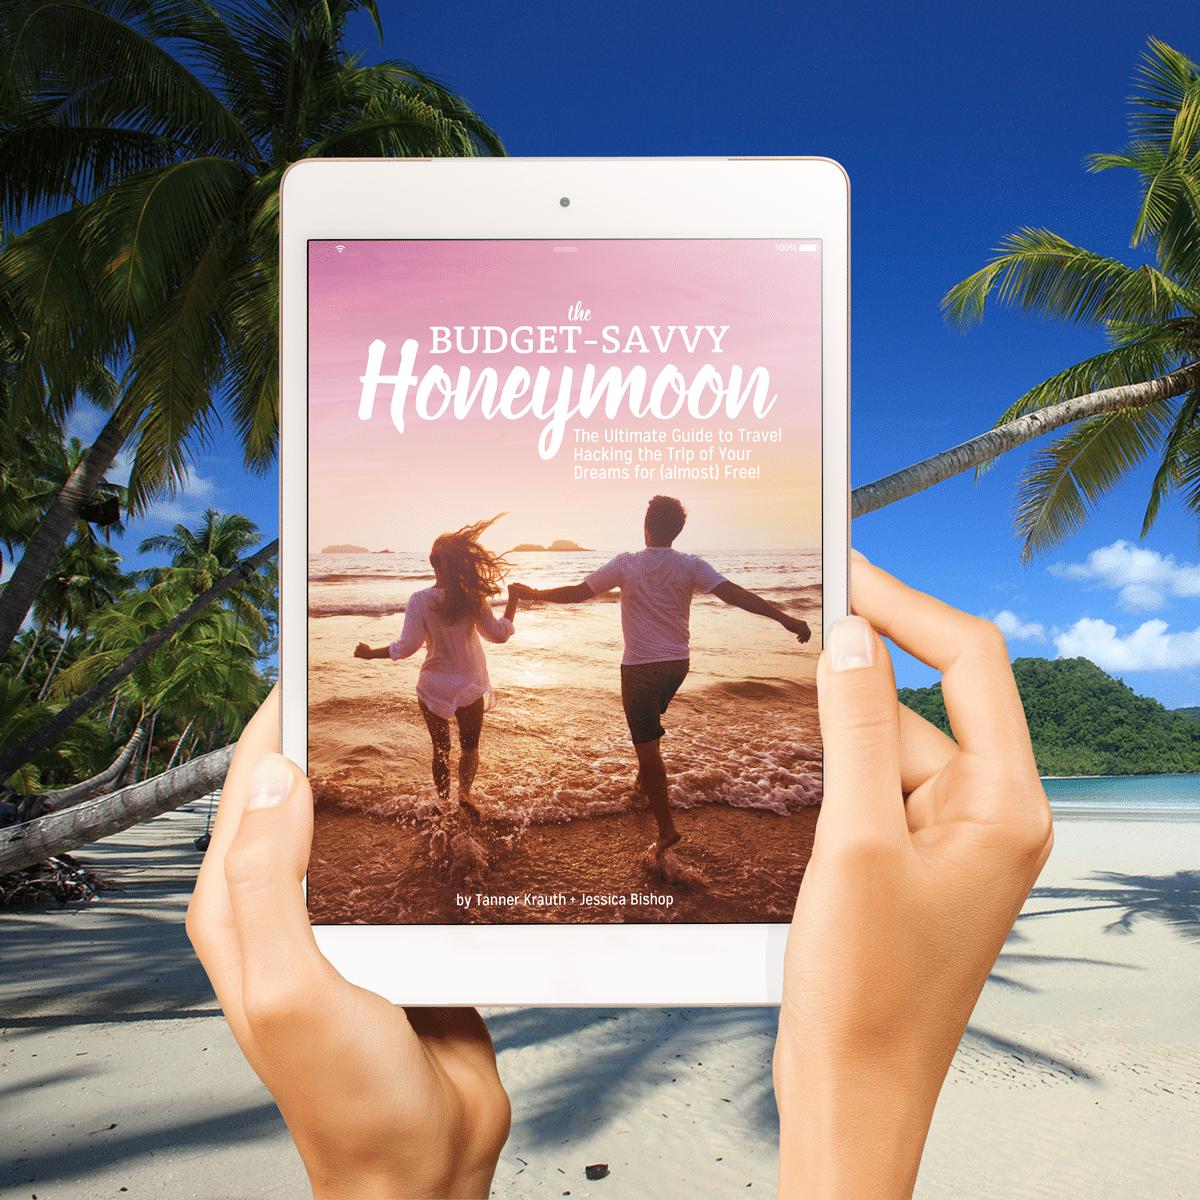 The Budget-Savvy Honeymoon E-book